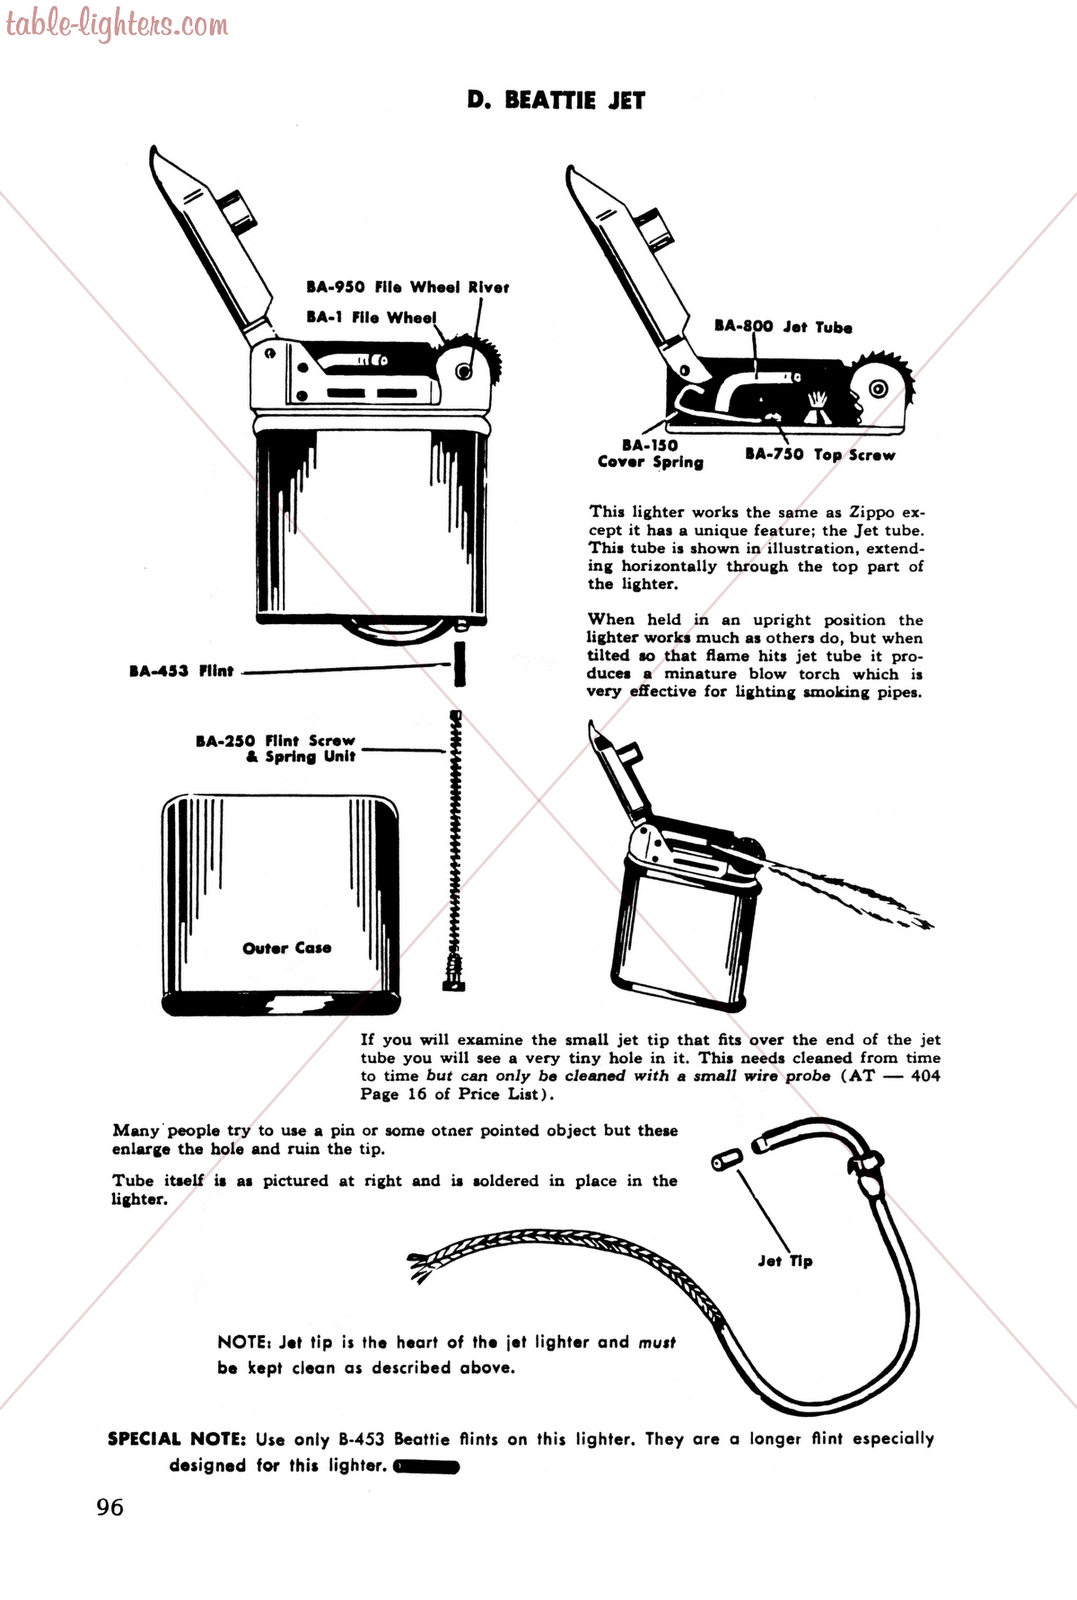 Table Lighters Collectors Guide Lighter Repair Manual